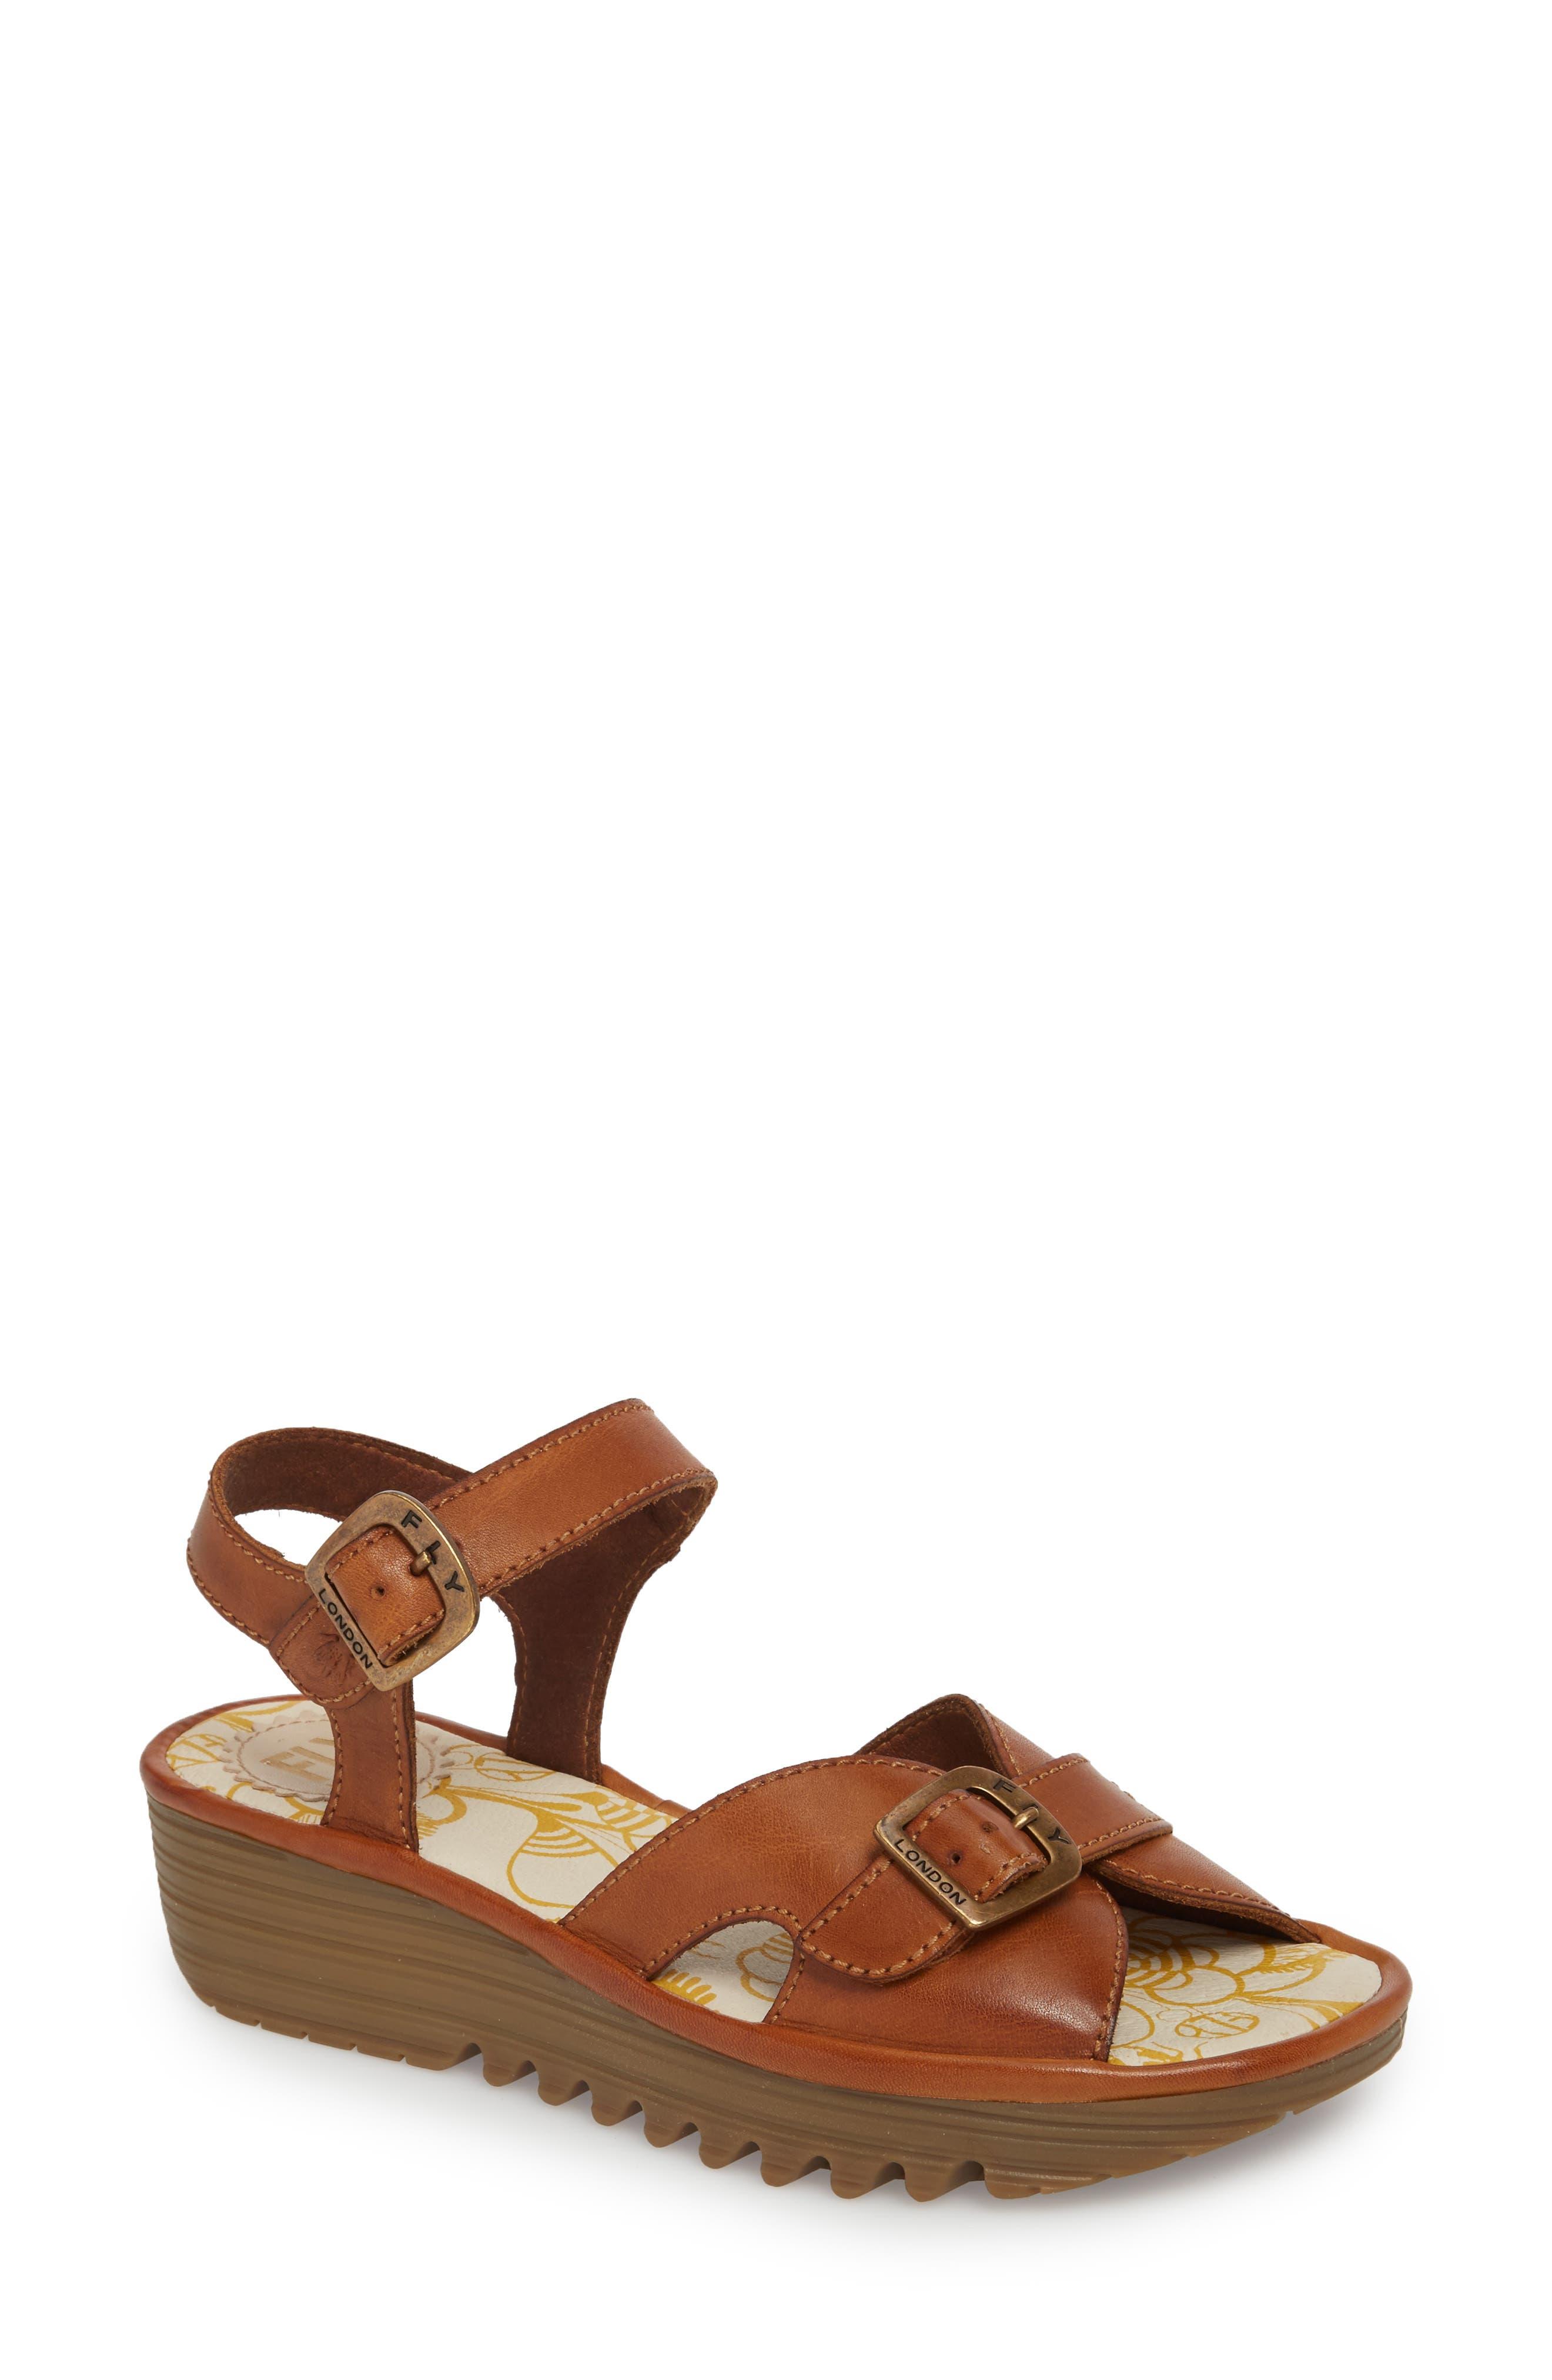 Egal Sandal,                             Main thumbnail 1, color,                             Tan Colmar Leather